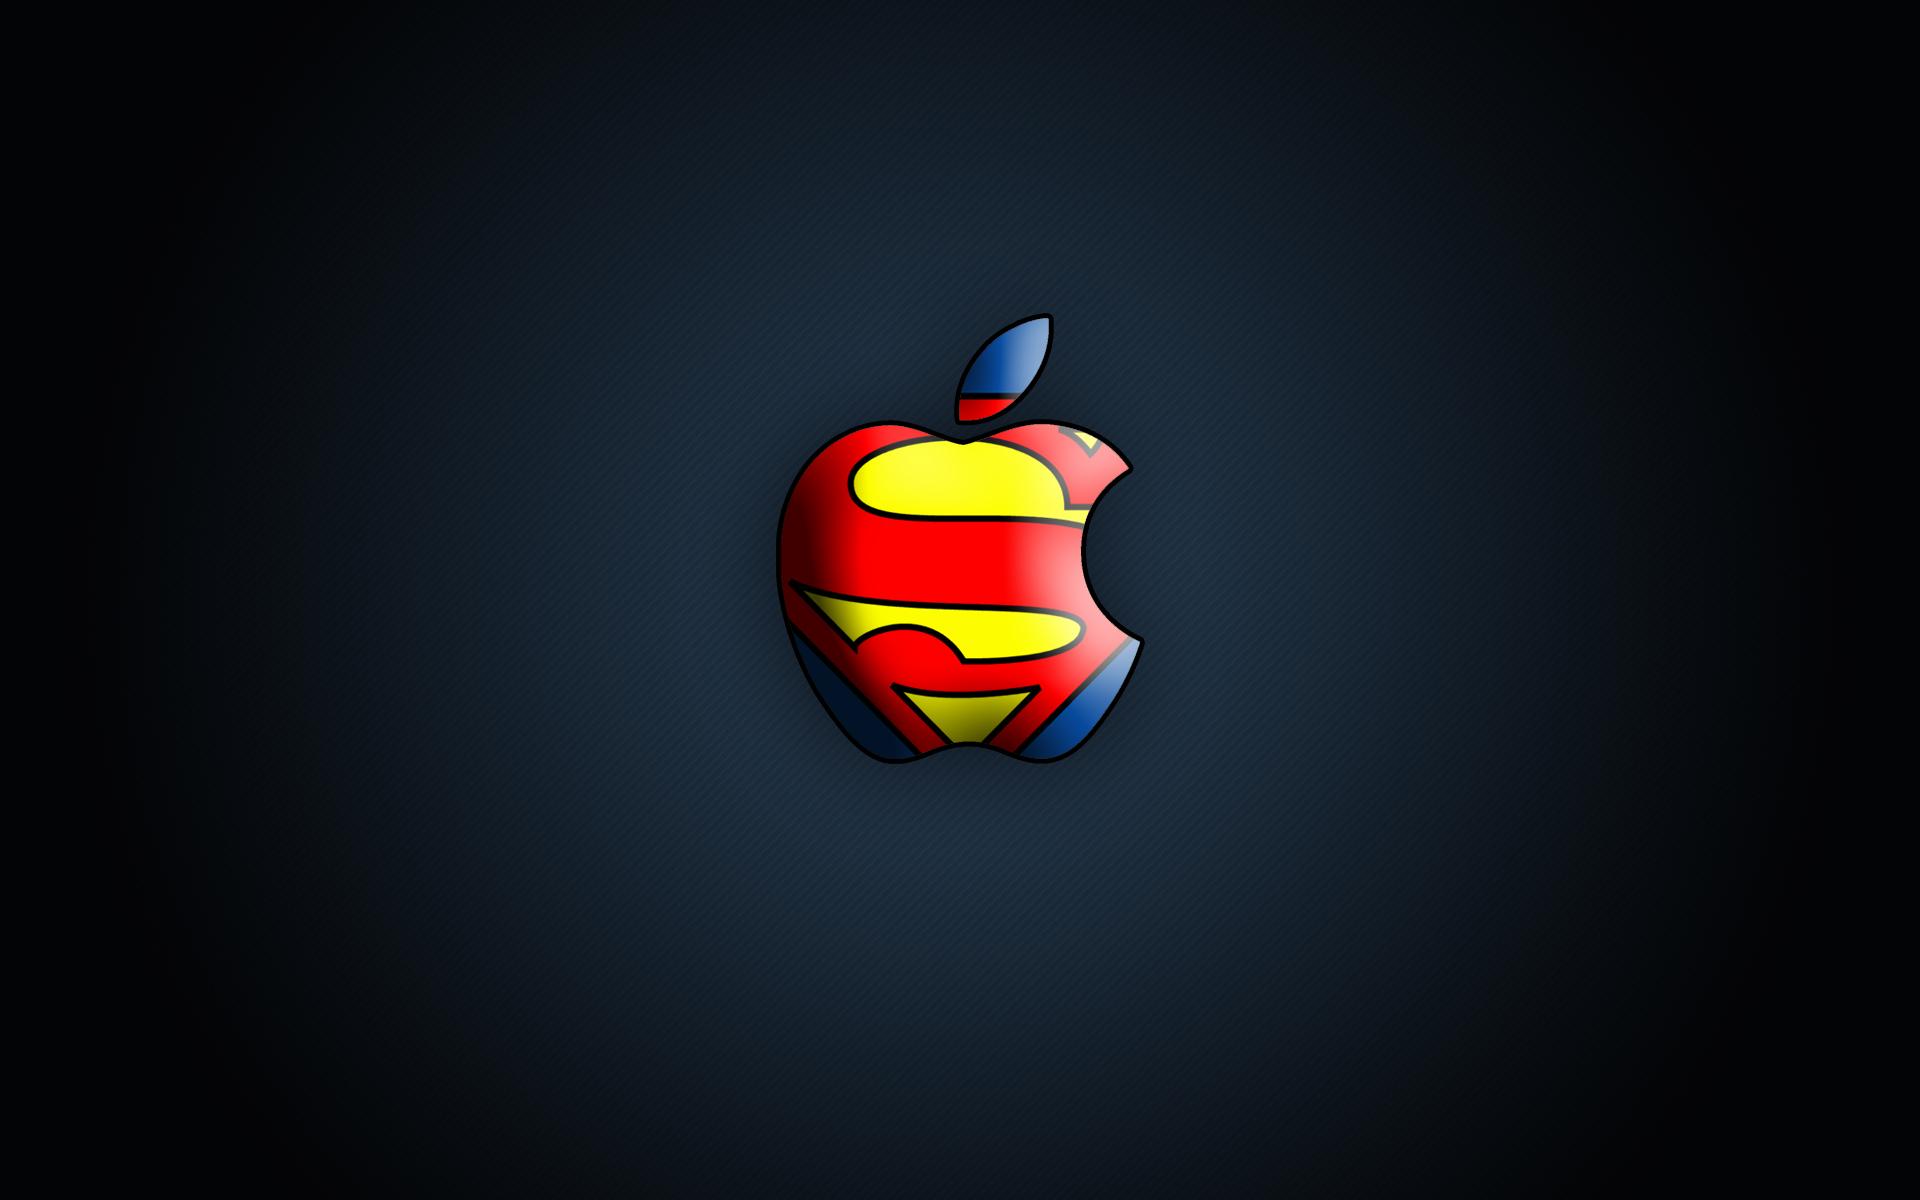 Free Mac Wallpaper